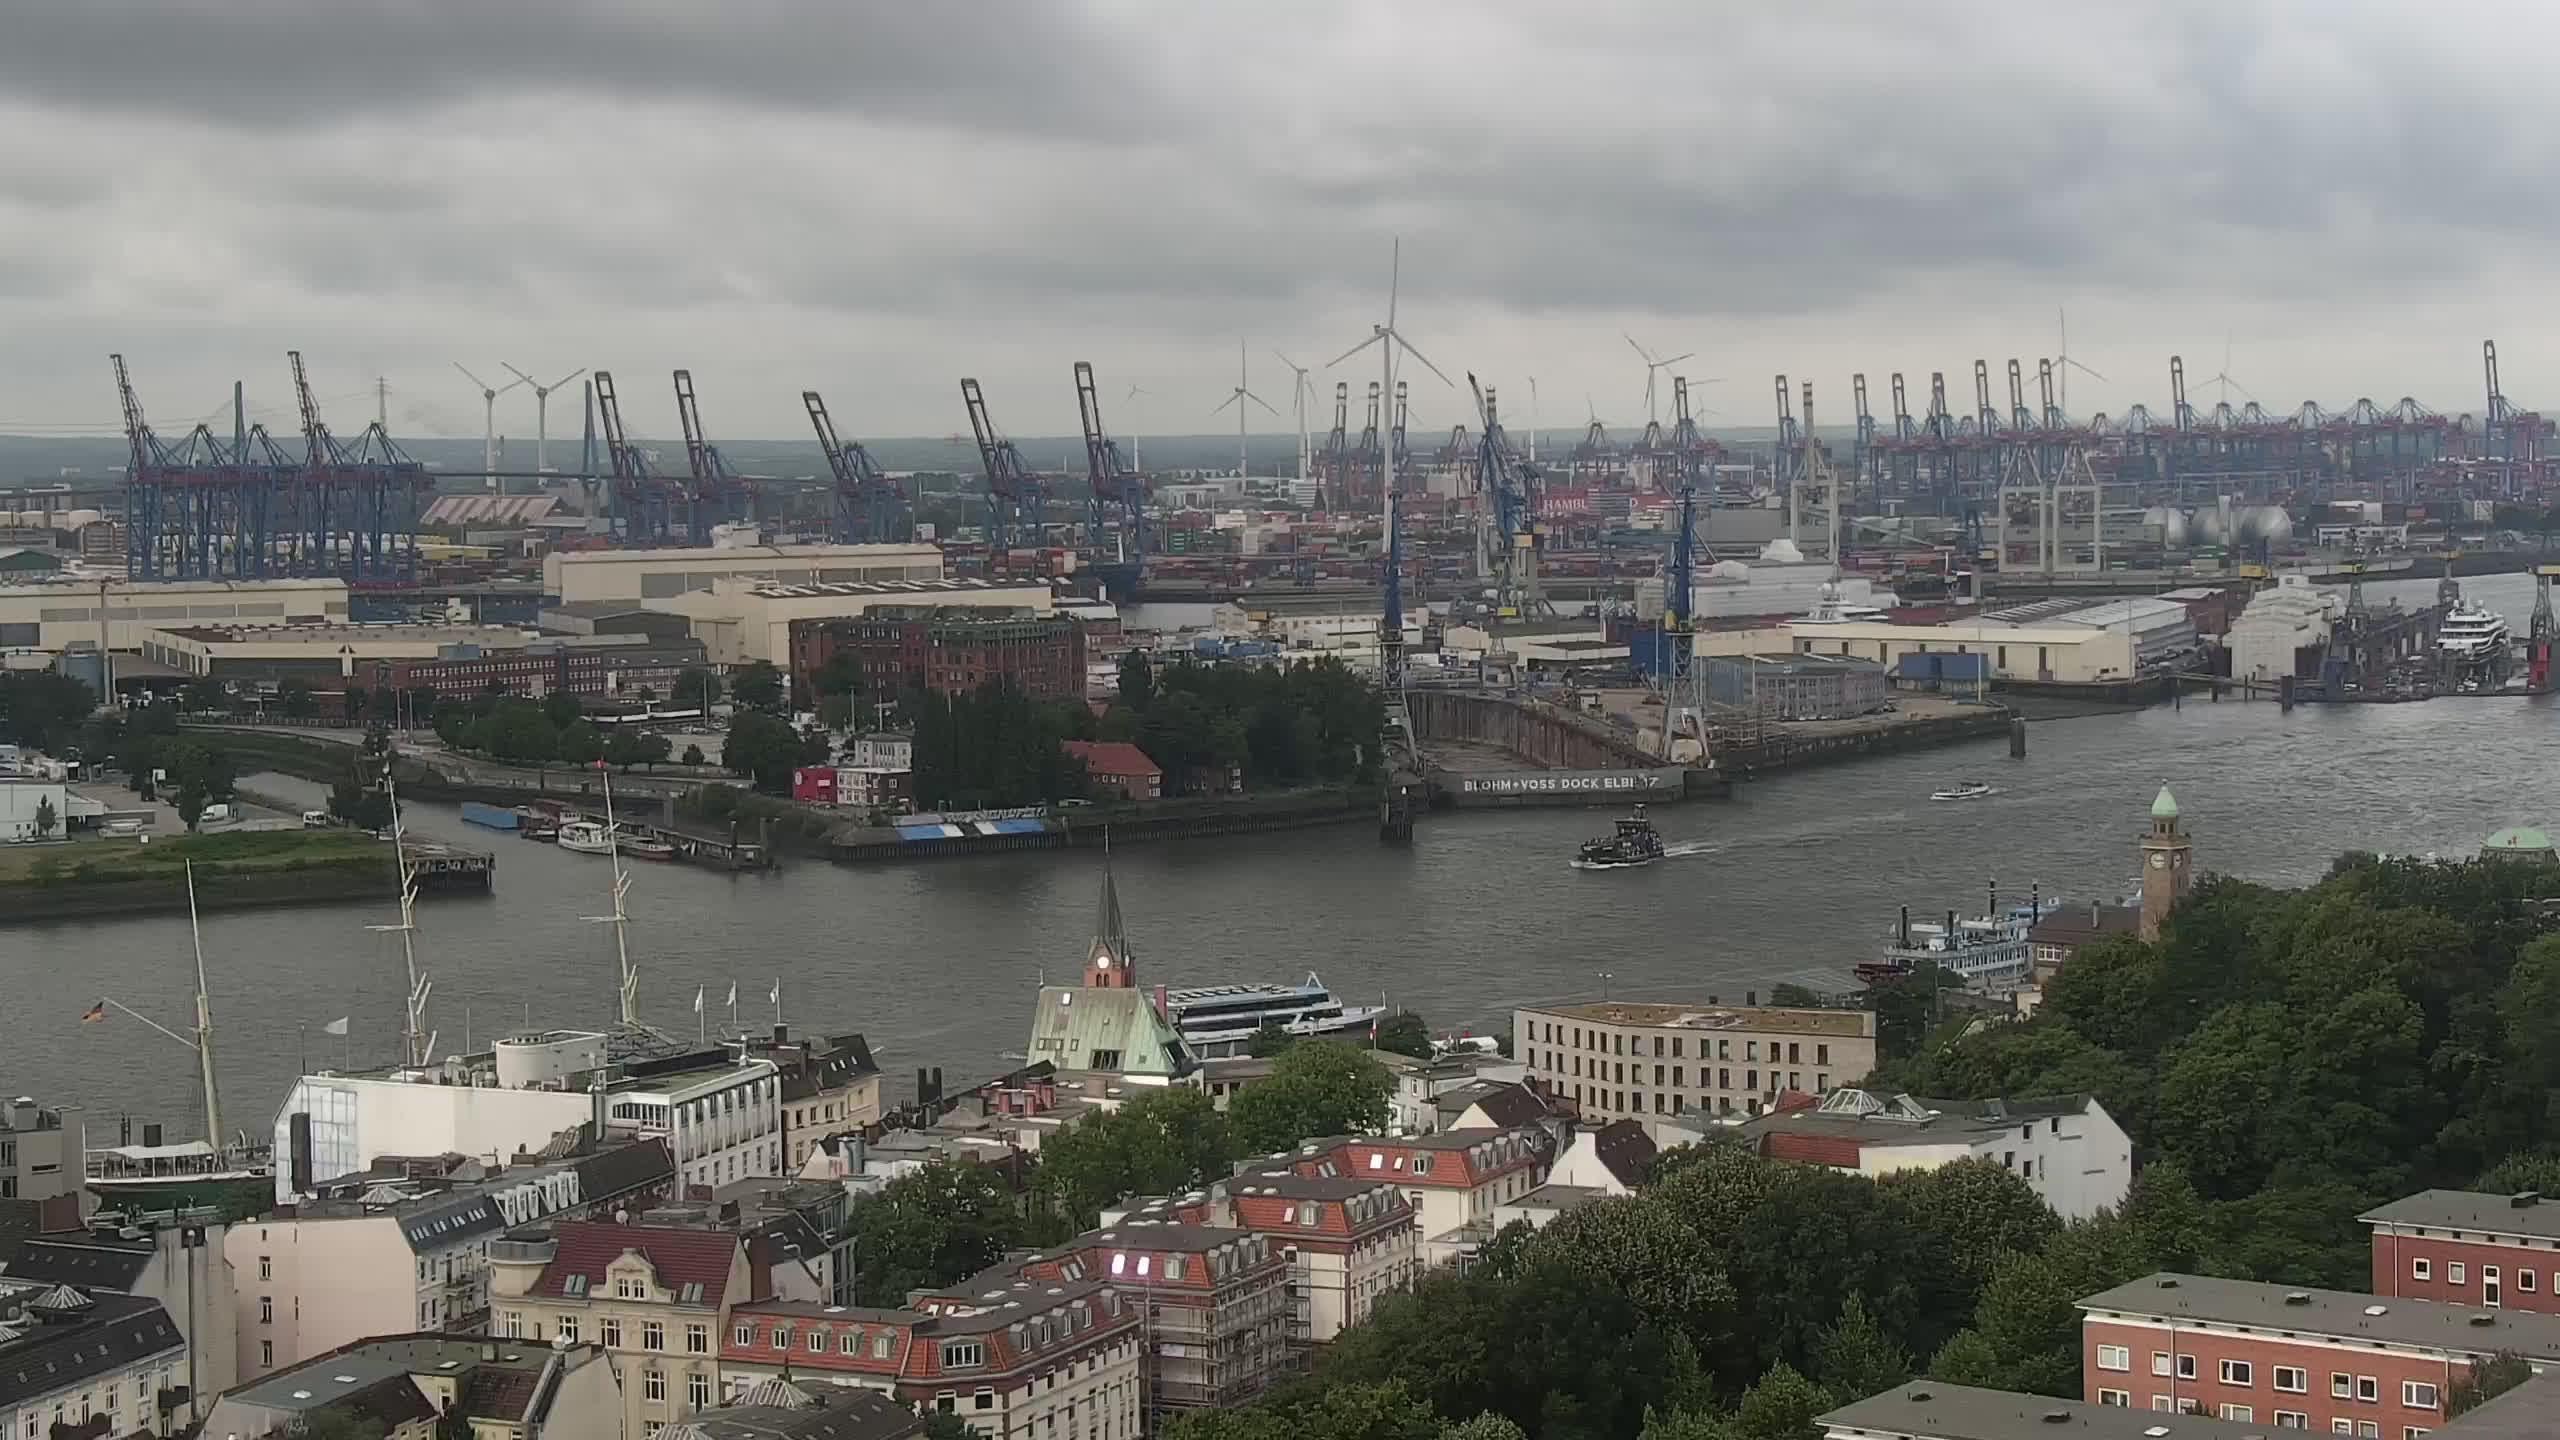 Hamburg Mon. 10:15